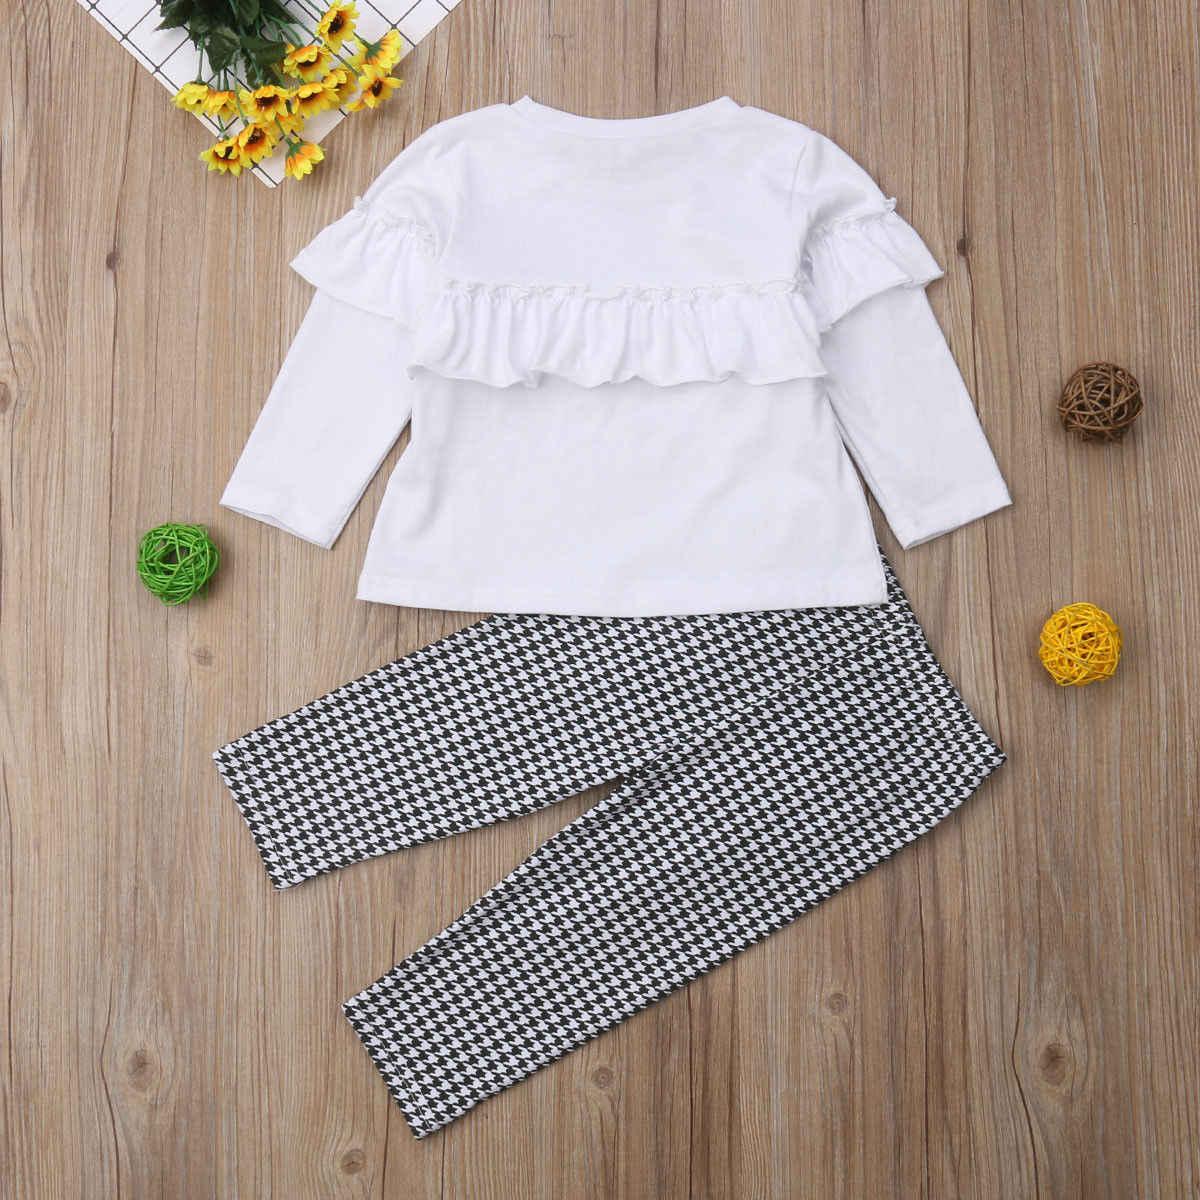 94506d1a39a4f ... Girls Clothes Set Autumn Flouncing Shirt Pants 2pcs Children Clothing  Set Fashion Kids Girl Outfits Plaid ...